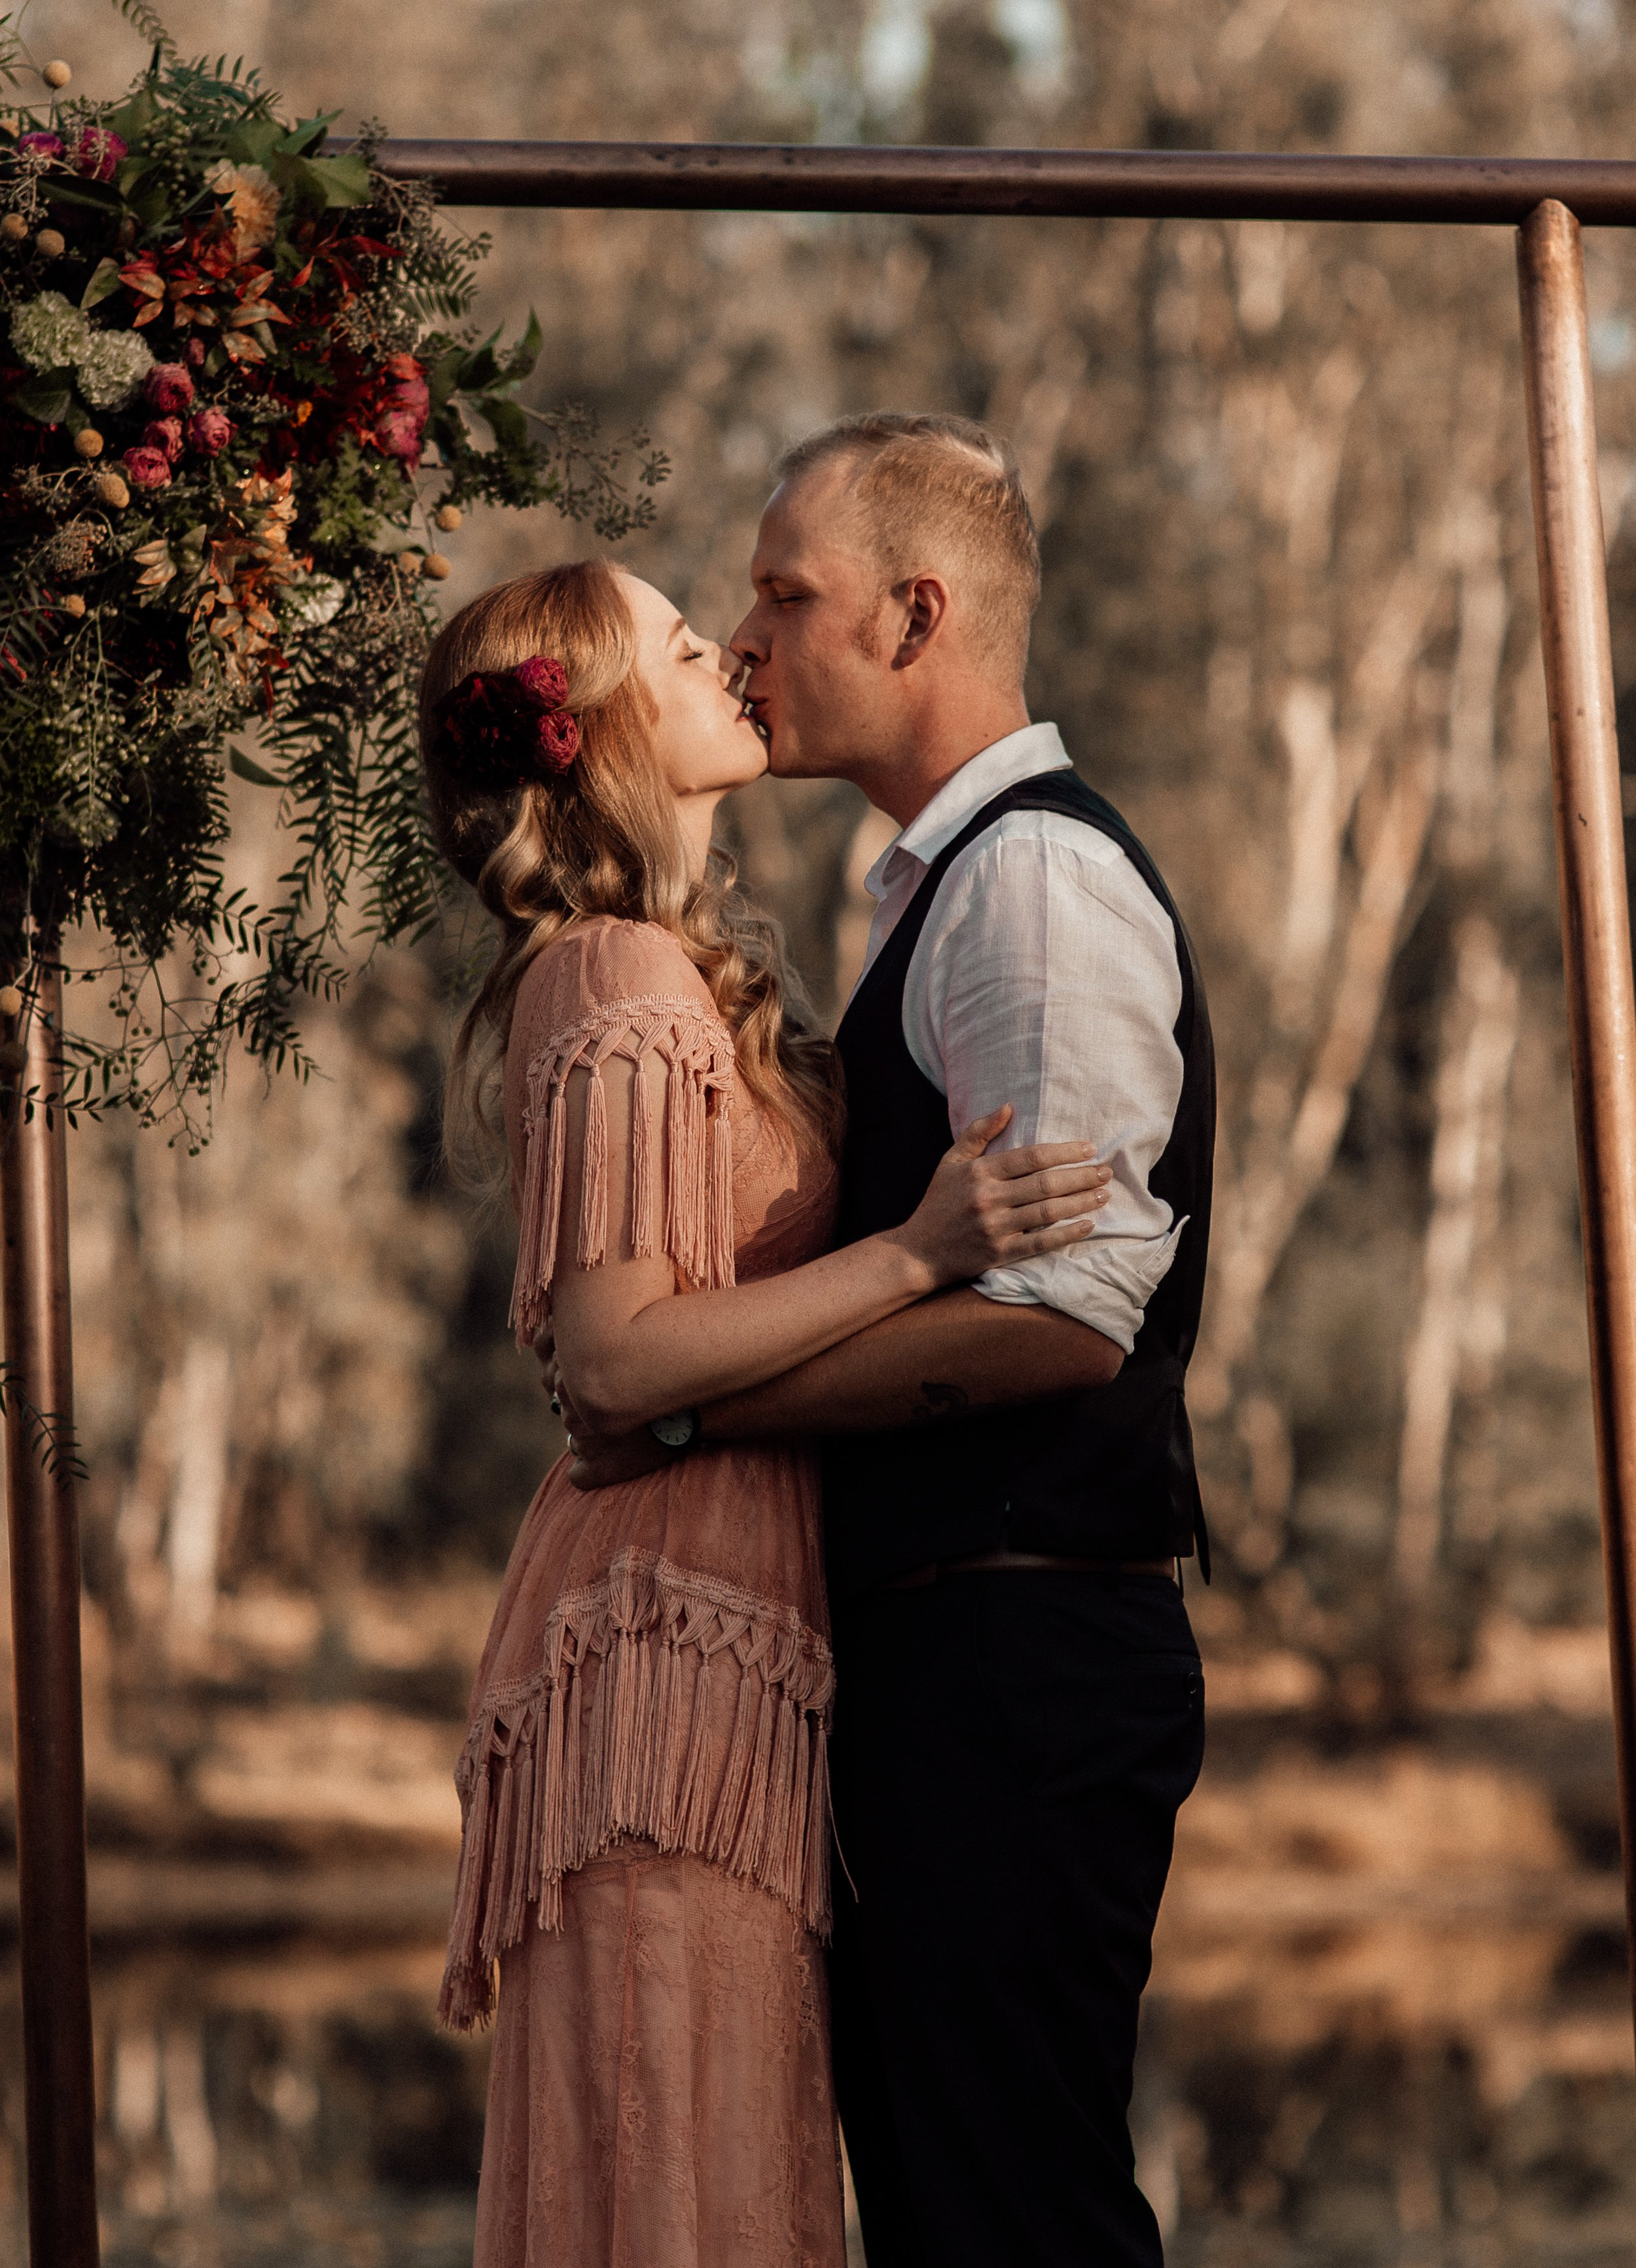 mickalathomas_puremacphotography_weddingphotographer_couplephotographer_Sheppartonphotographer_2071.jpg